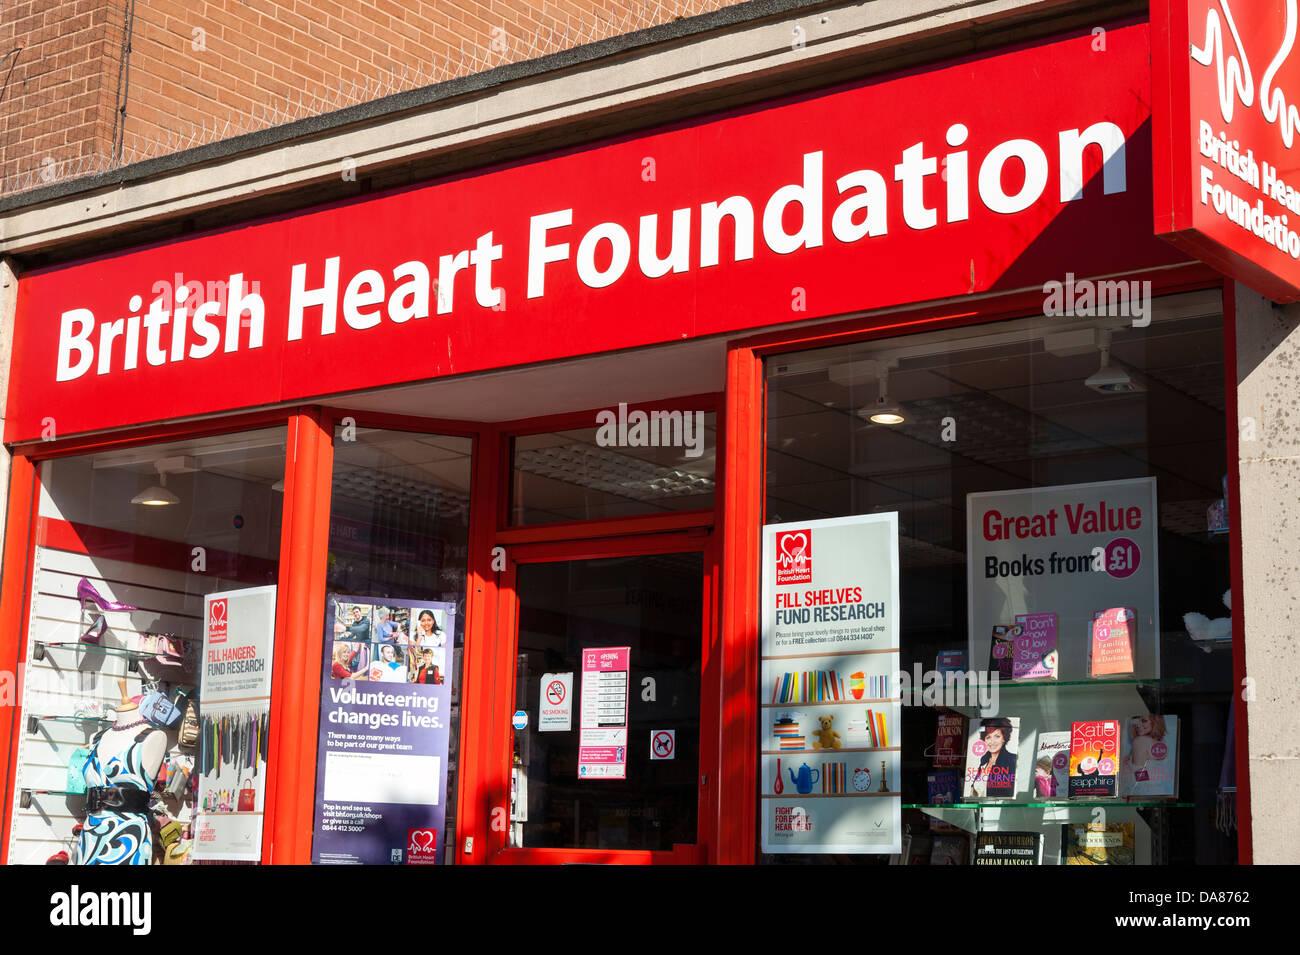 British Heart Foundation charity shop, UK. - Stock Image